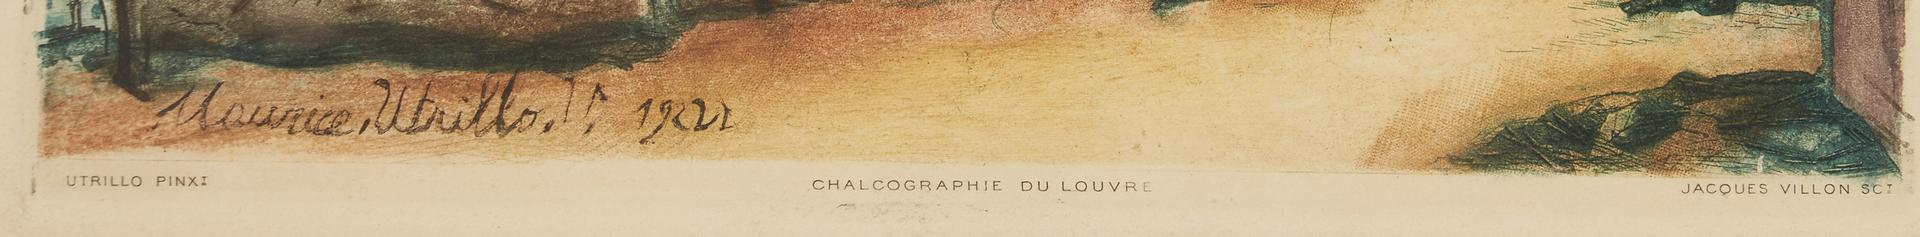 Lot 886: 3 J. Villon Prints After Friesz, Cezanne, Utrillo